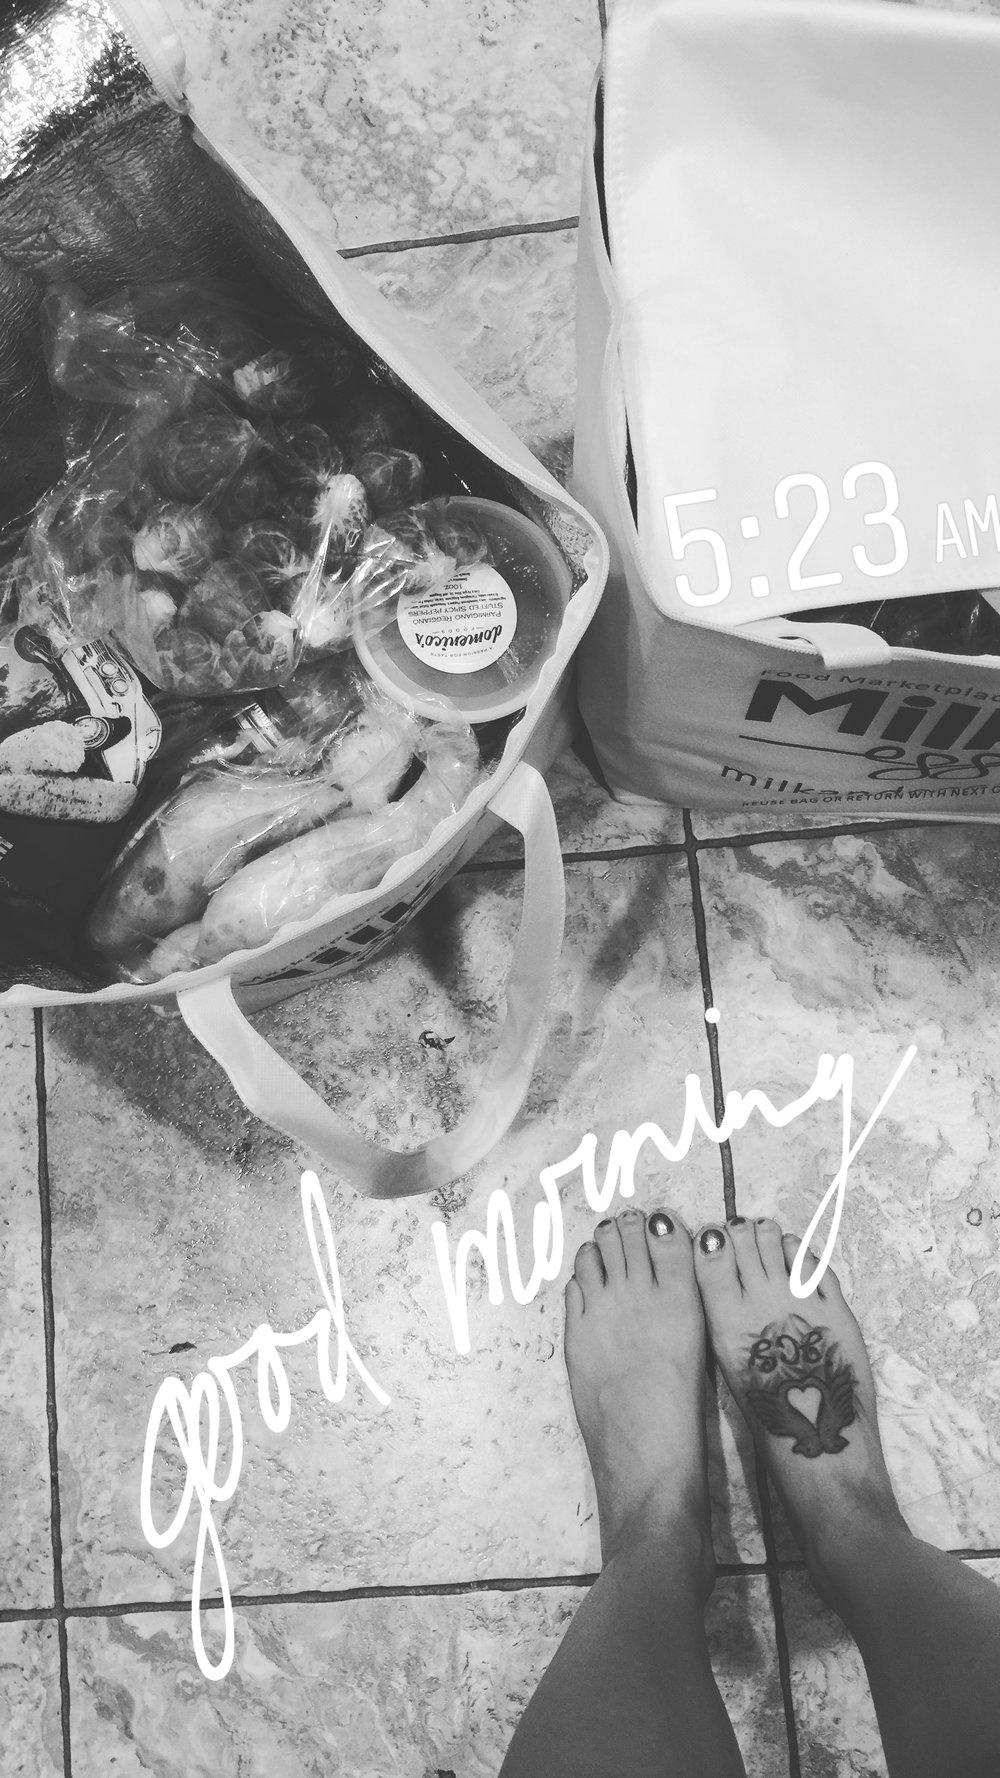 From Jenna's Instagram Story (@mrsjennamartin)